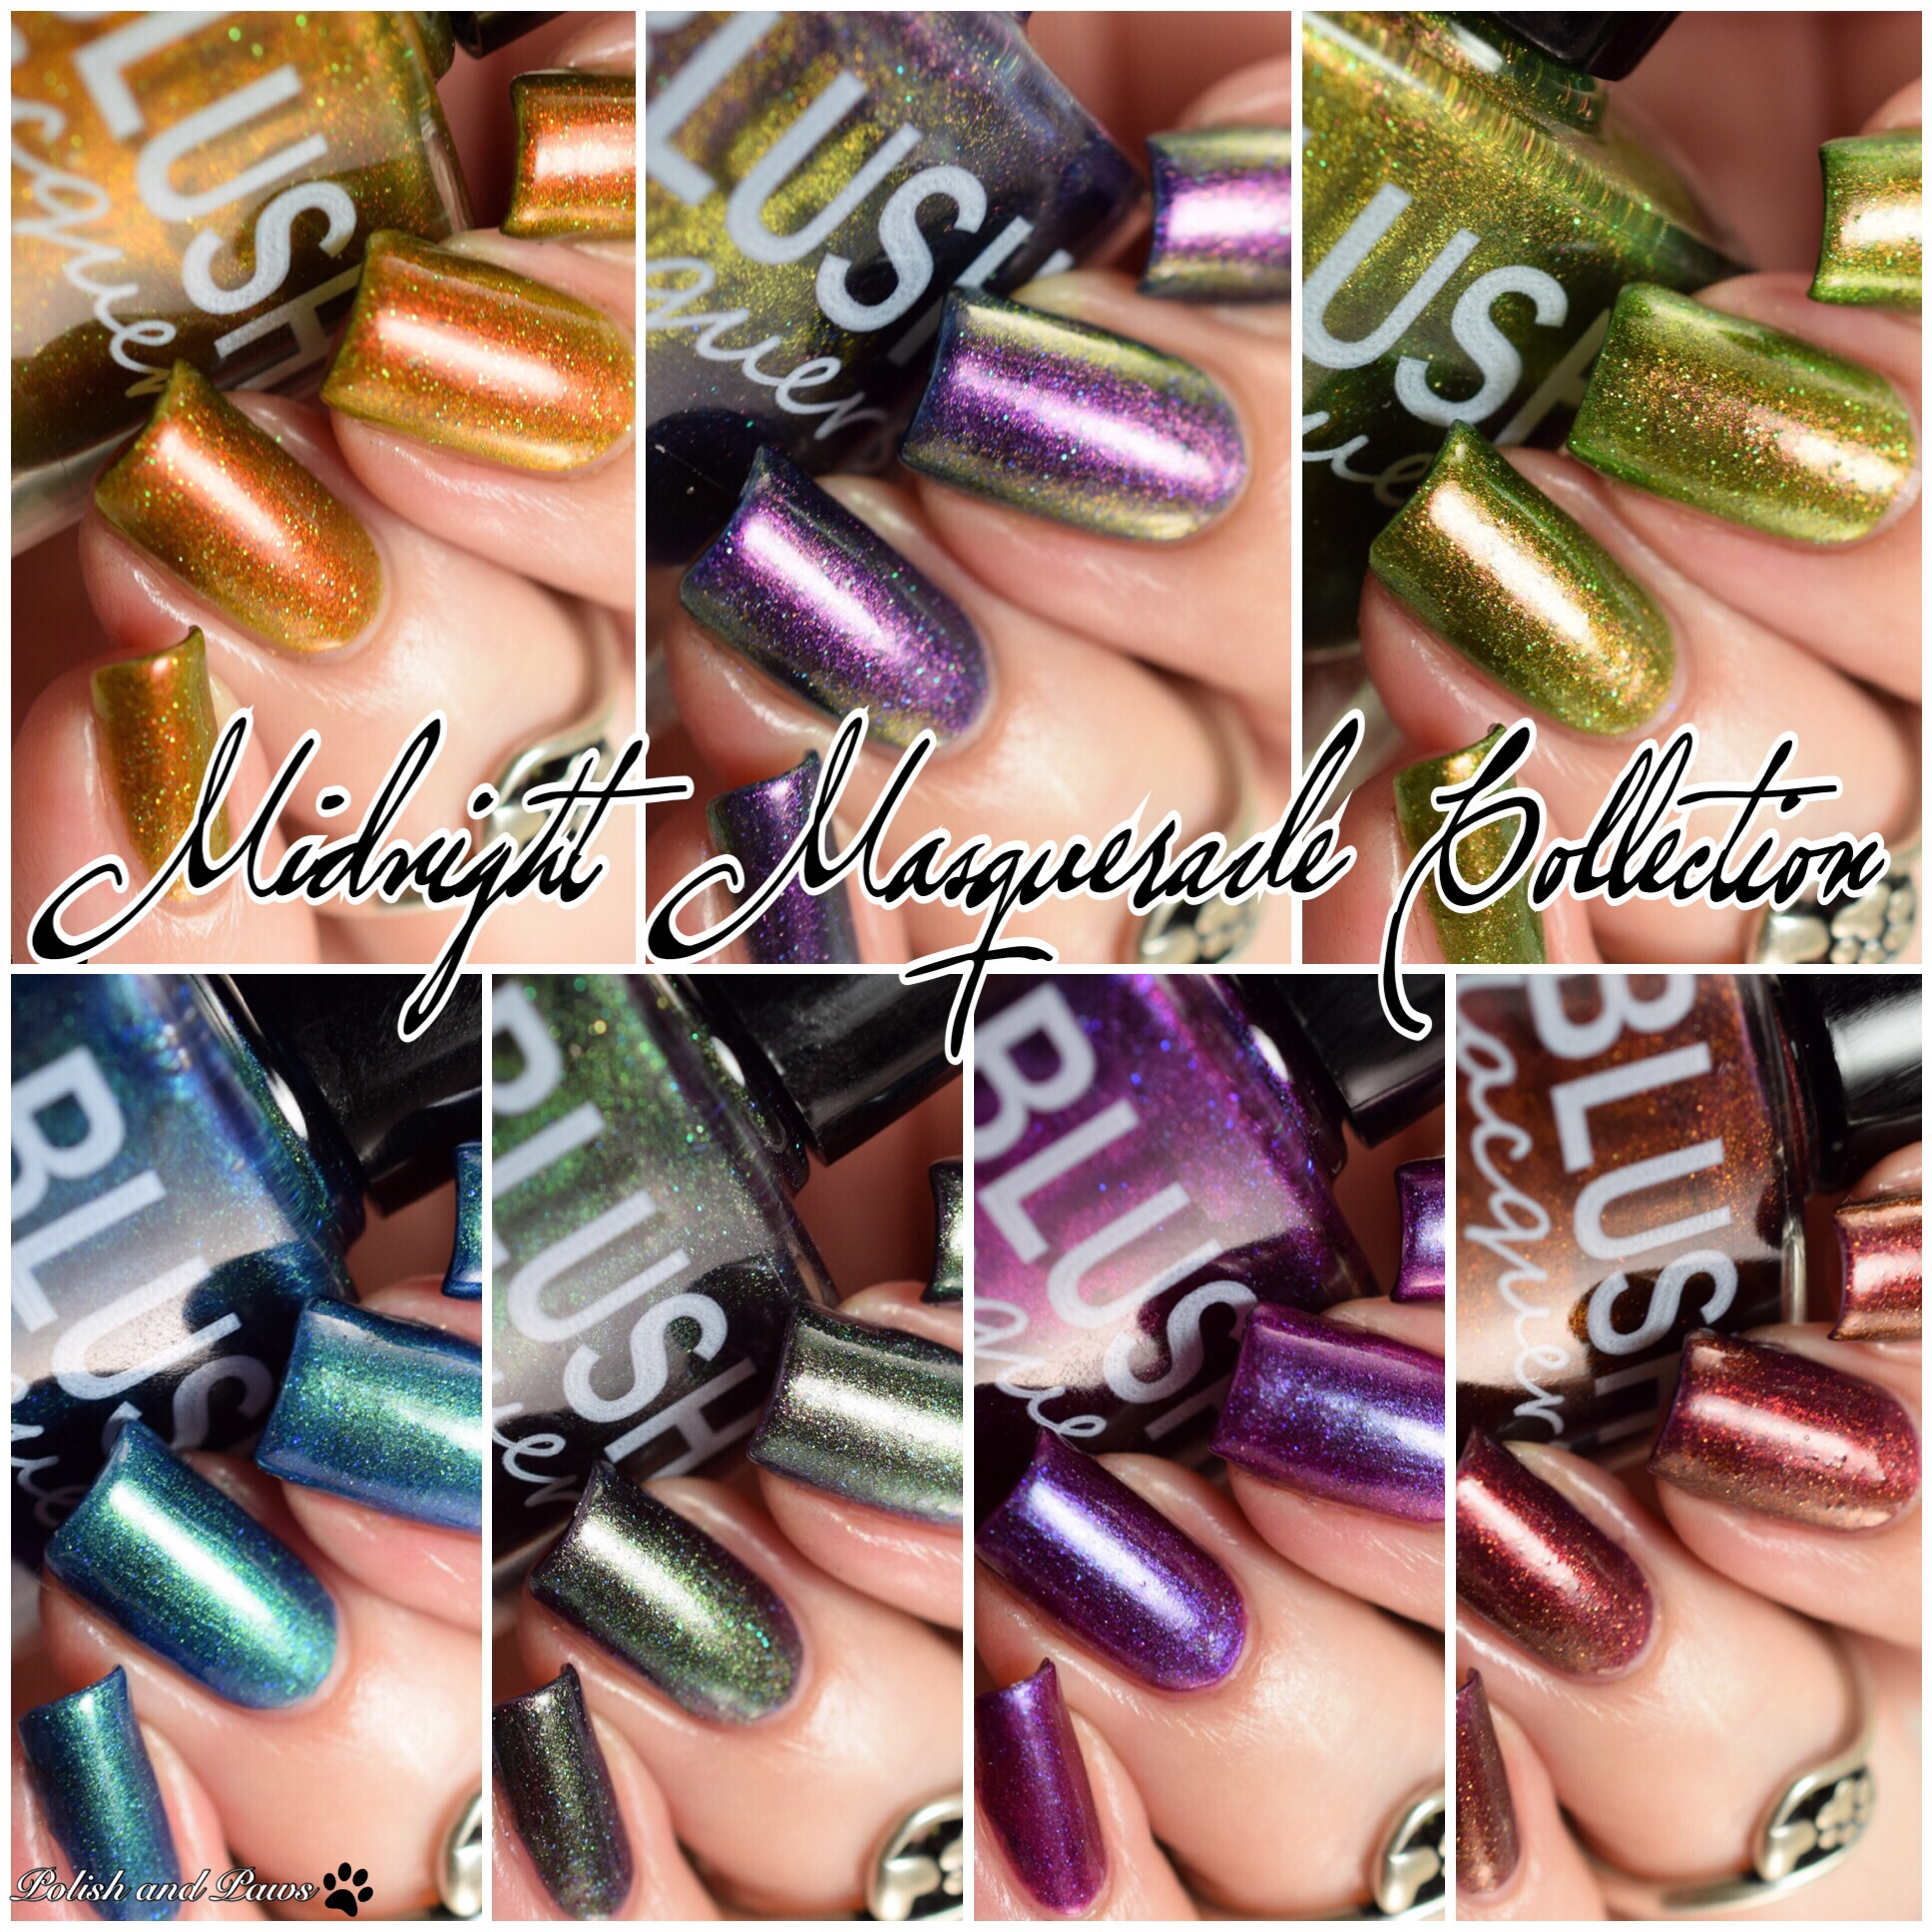 Blush Lacquers Midnight Masquerade Collection